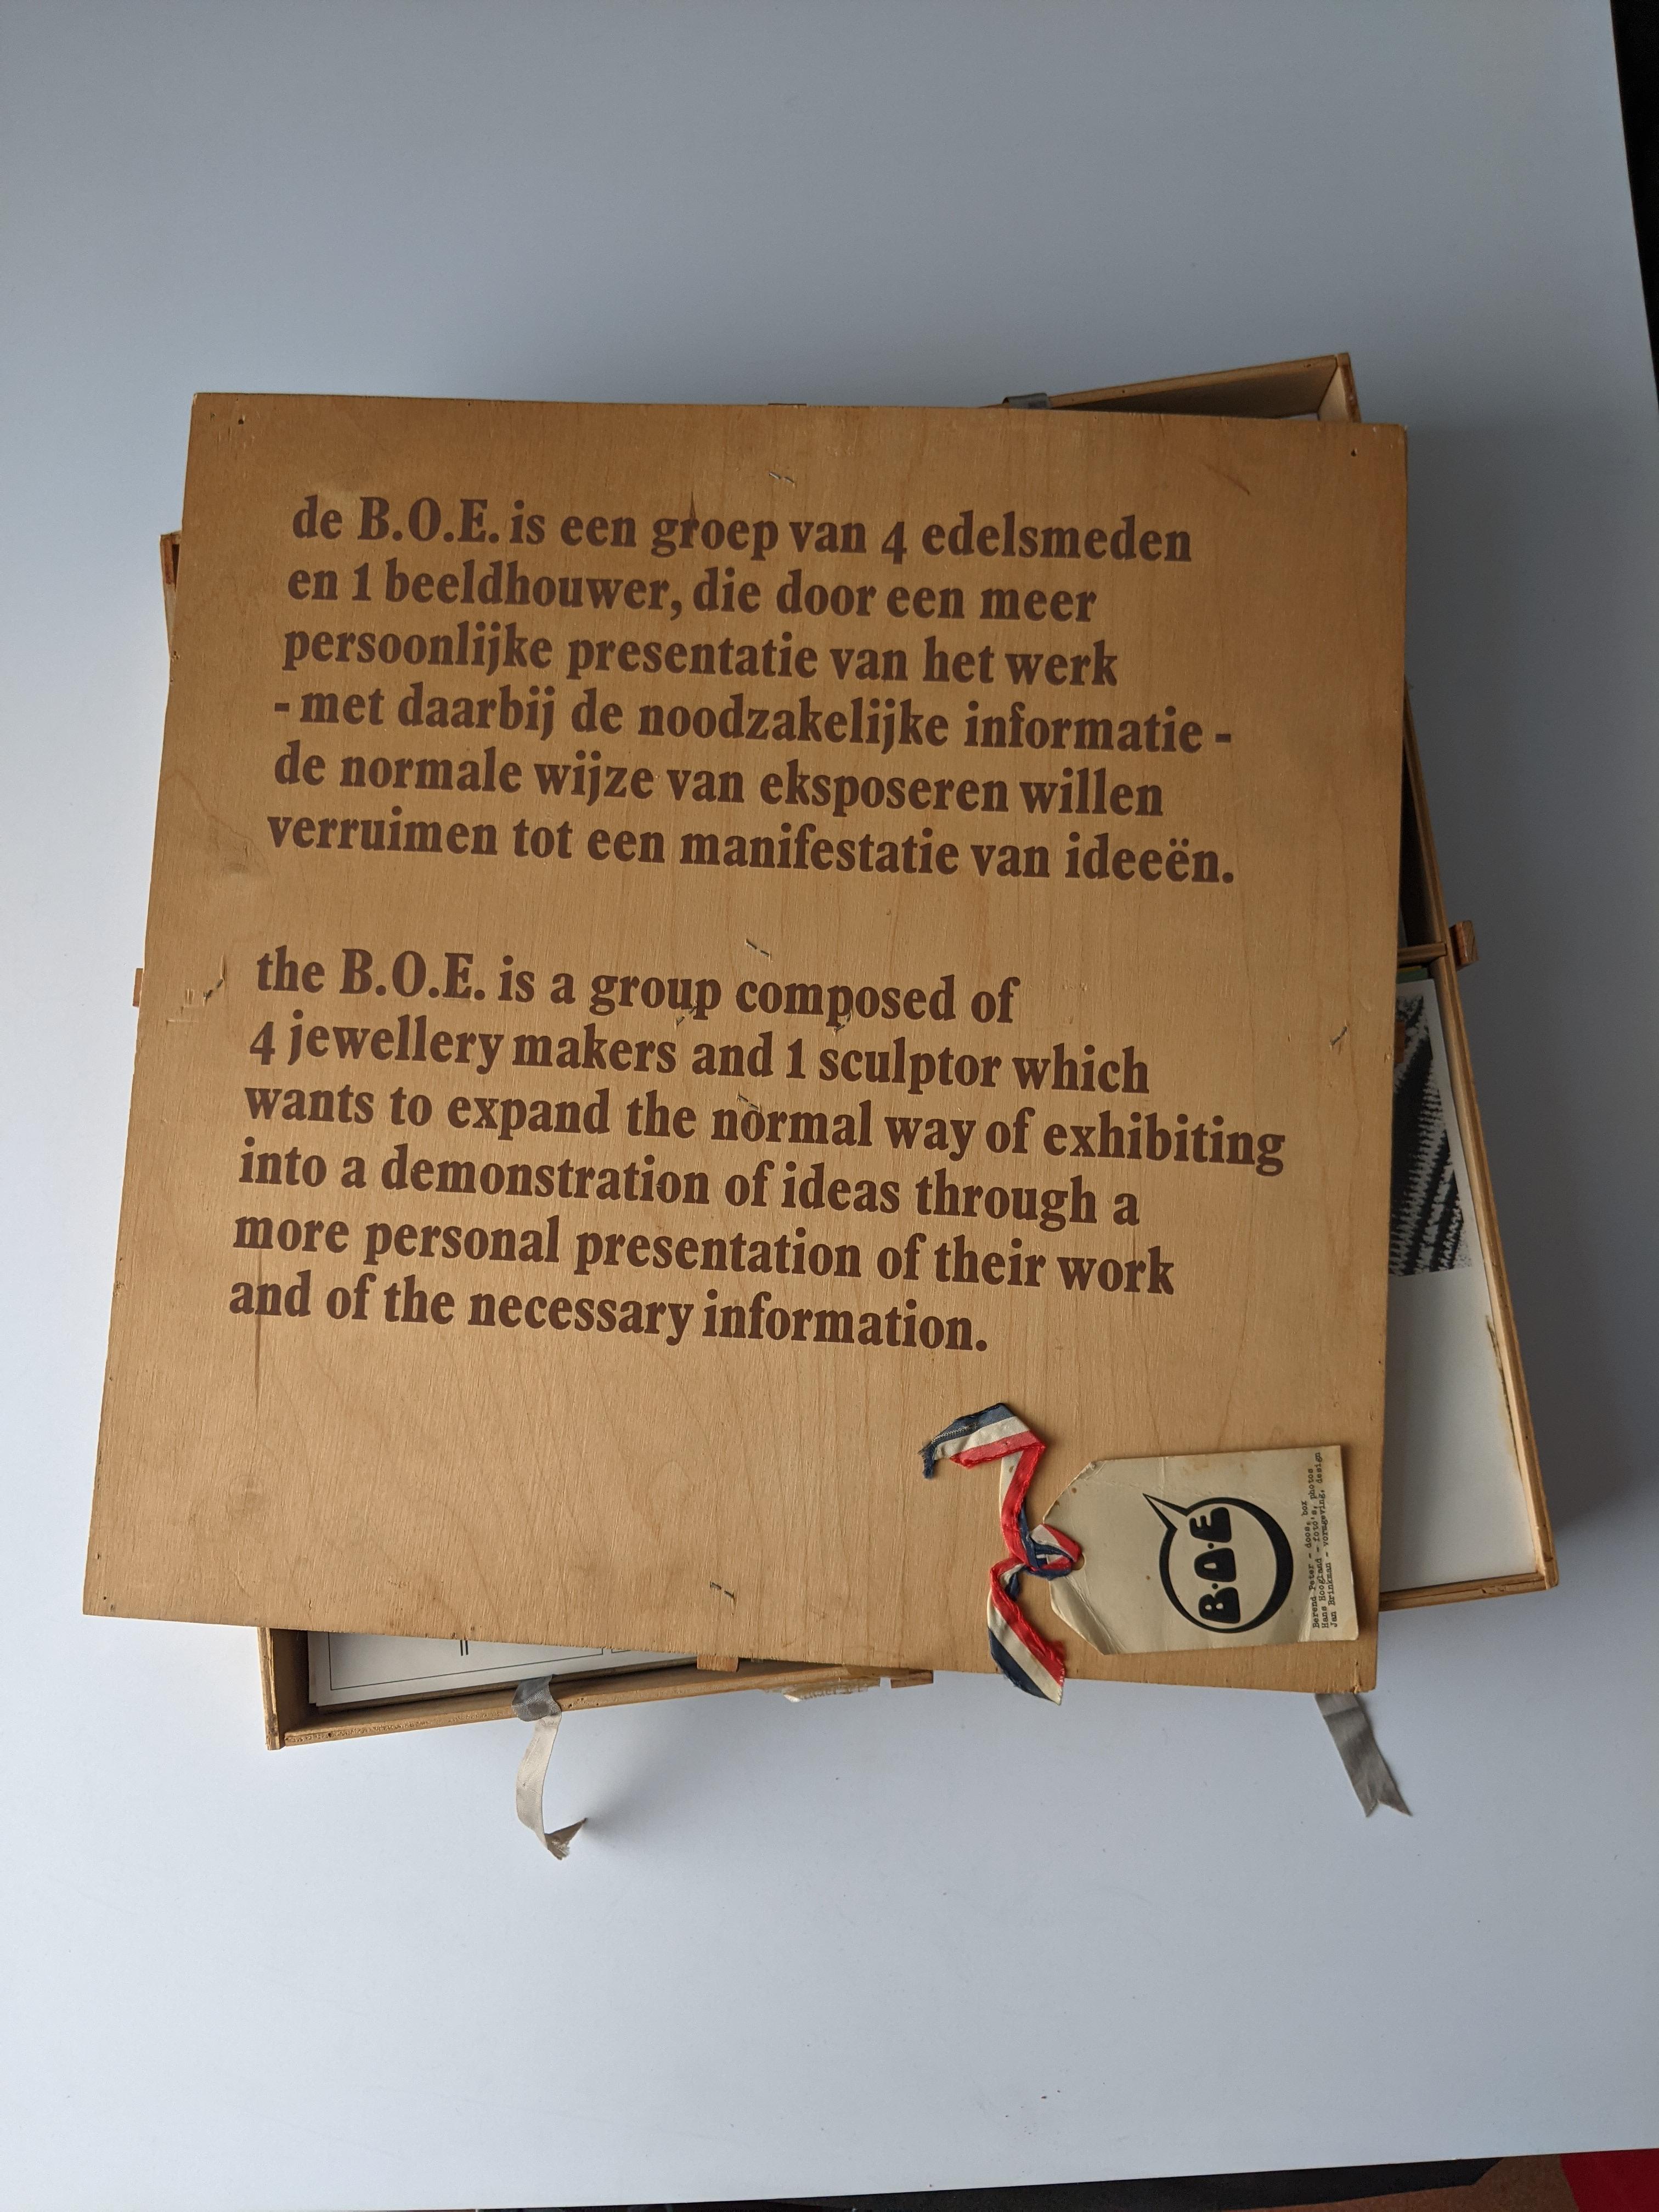 B.O.E. doos, 1974. Collectie Paul Derrez & Willem Hoogstede. Foto Willem Hoogstede, hout, papier, lint